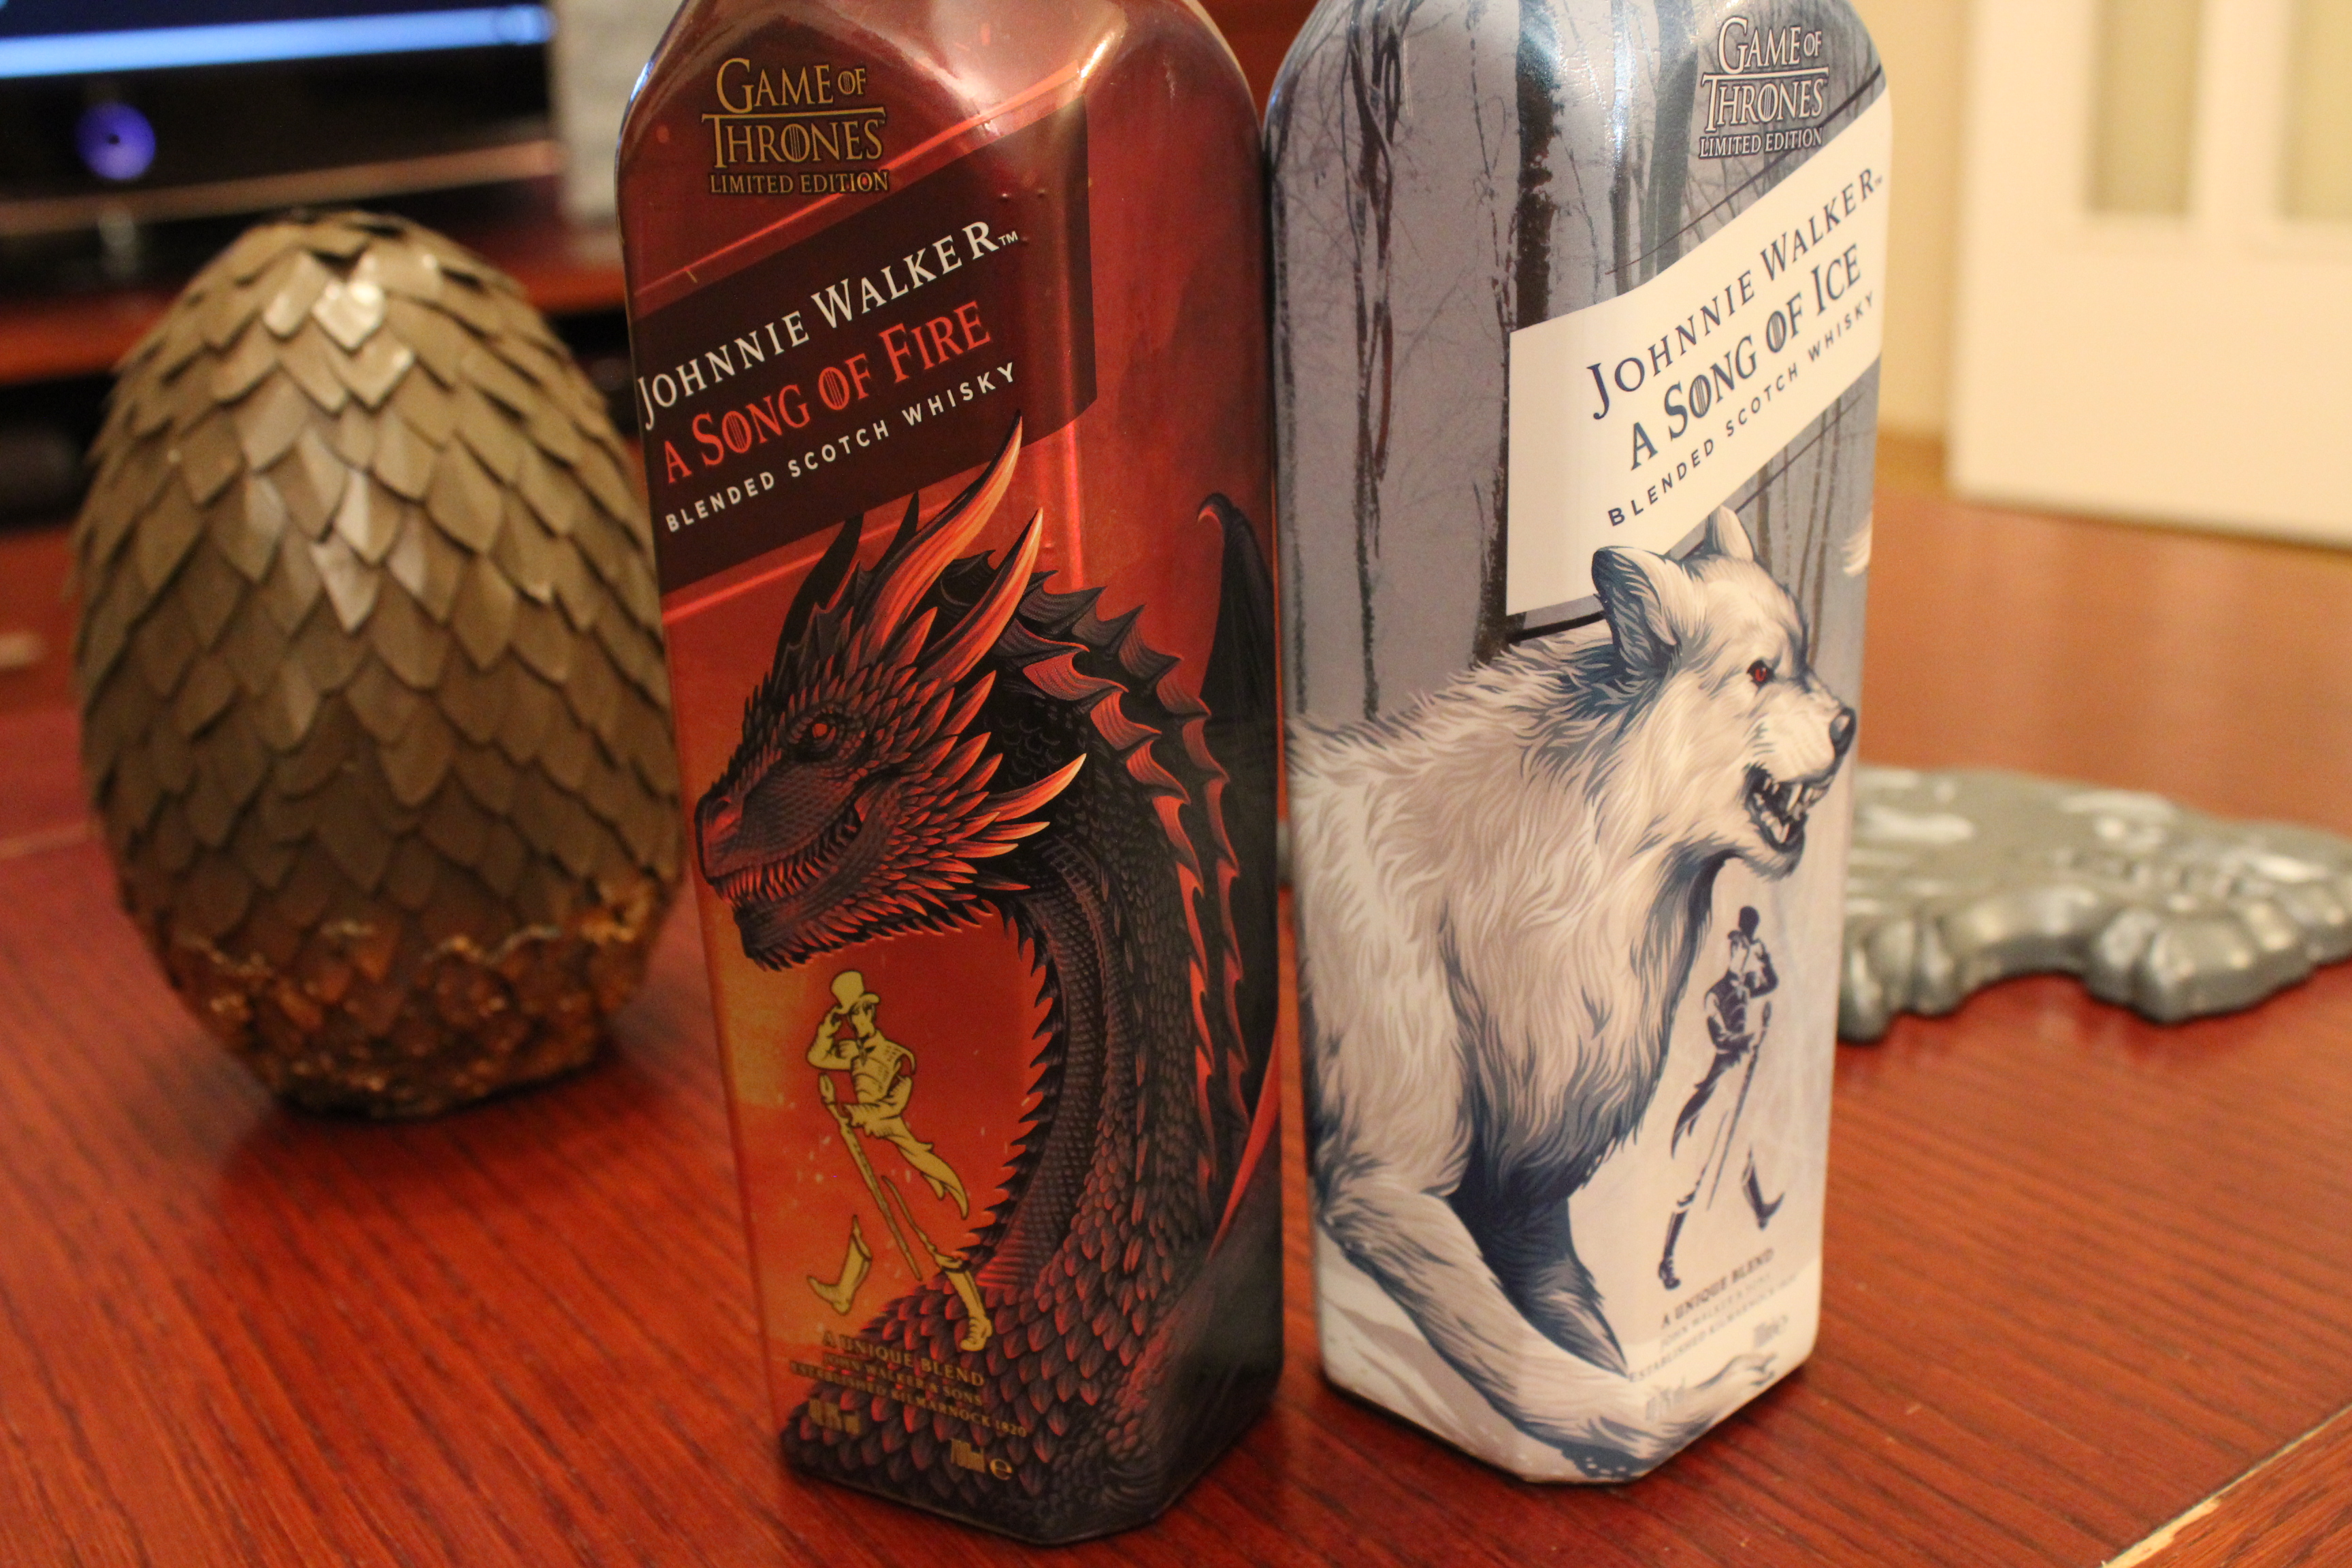 szmk_game_of_thrones_tronok_harca_johnnie_walker_whisky_scotch_tel_kozeleg_tuz_es_jeg_dala_hbo_48_masolata.JPG